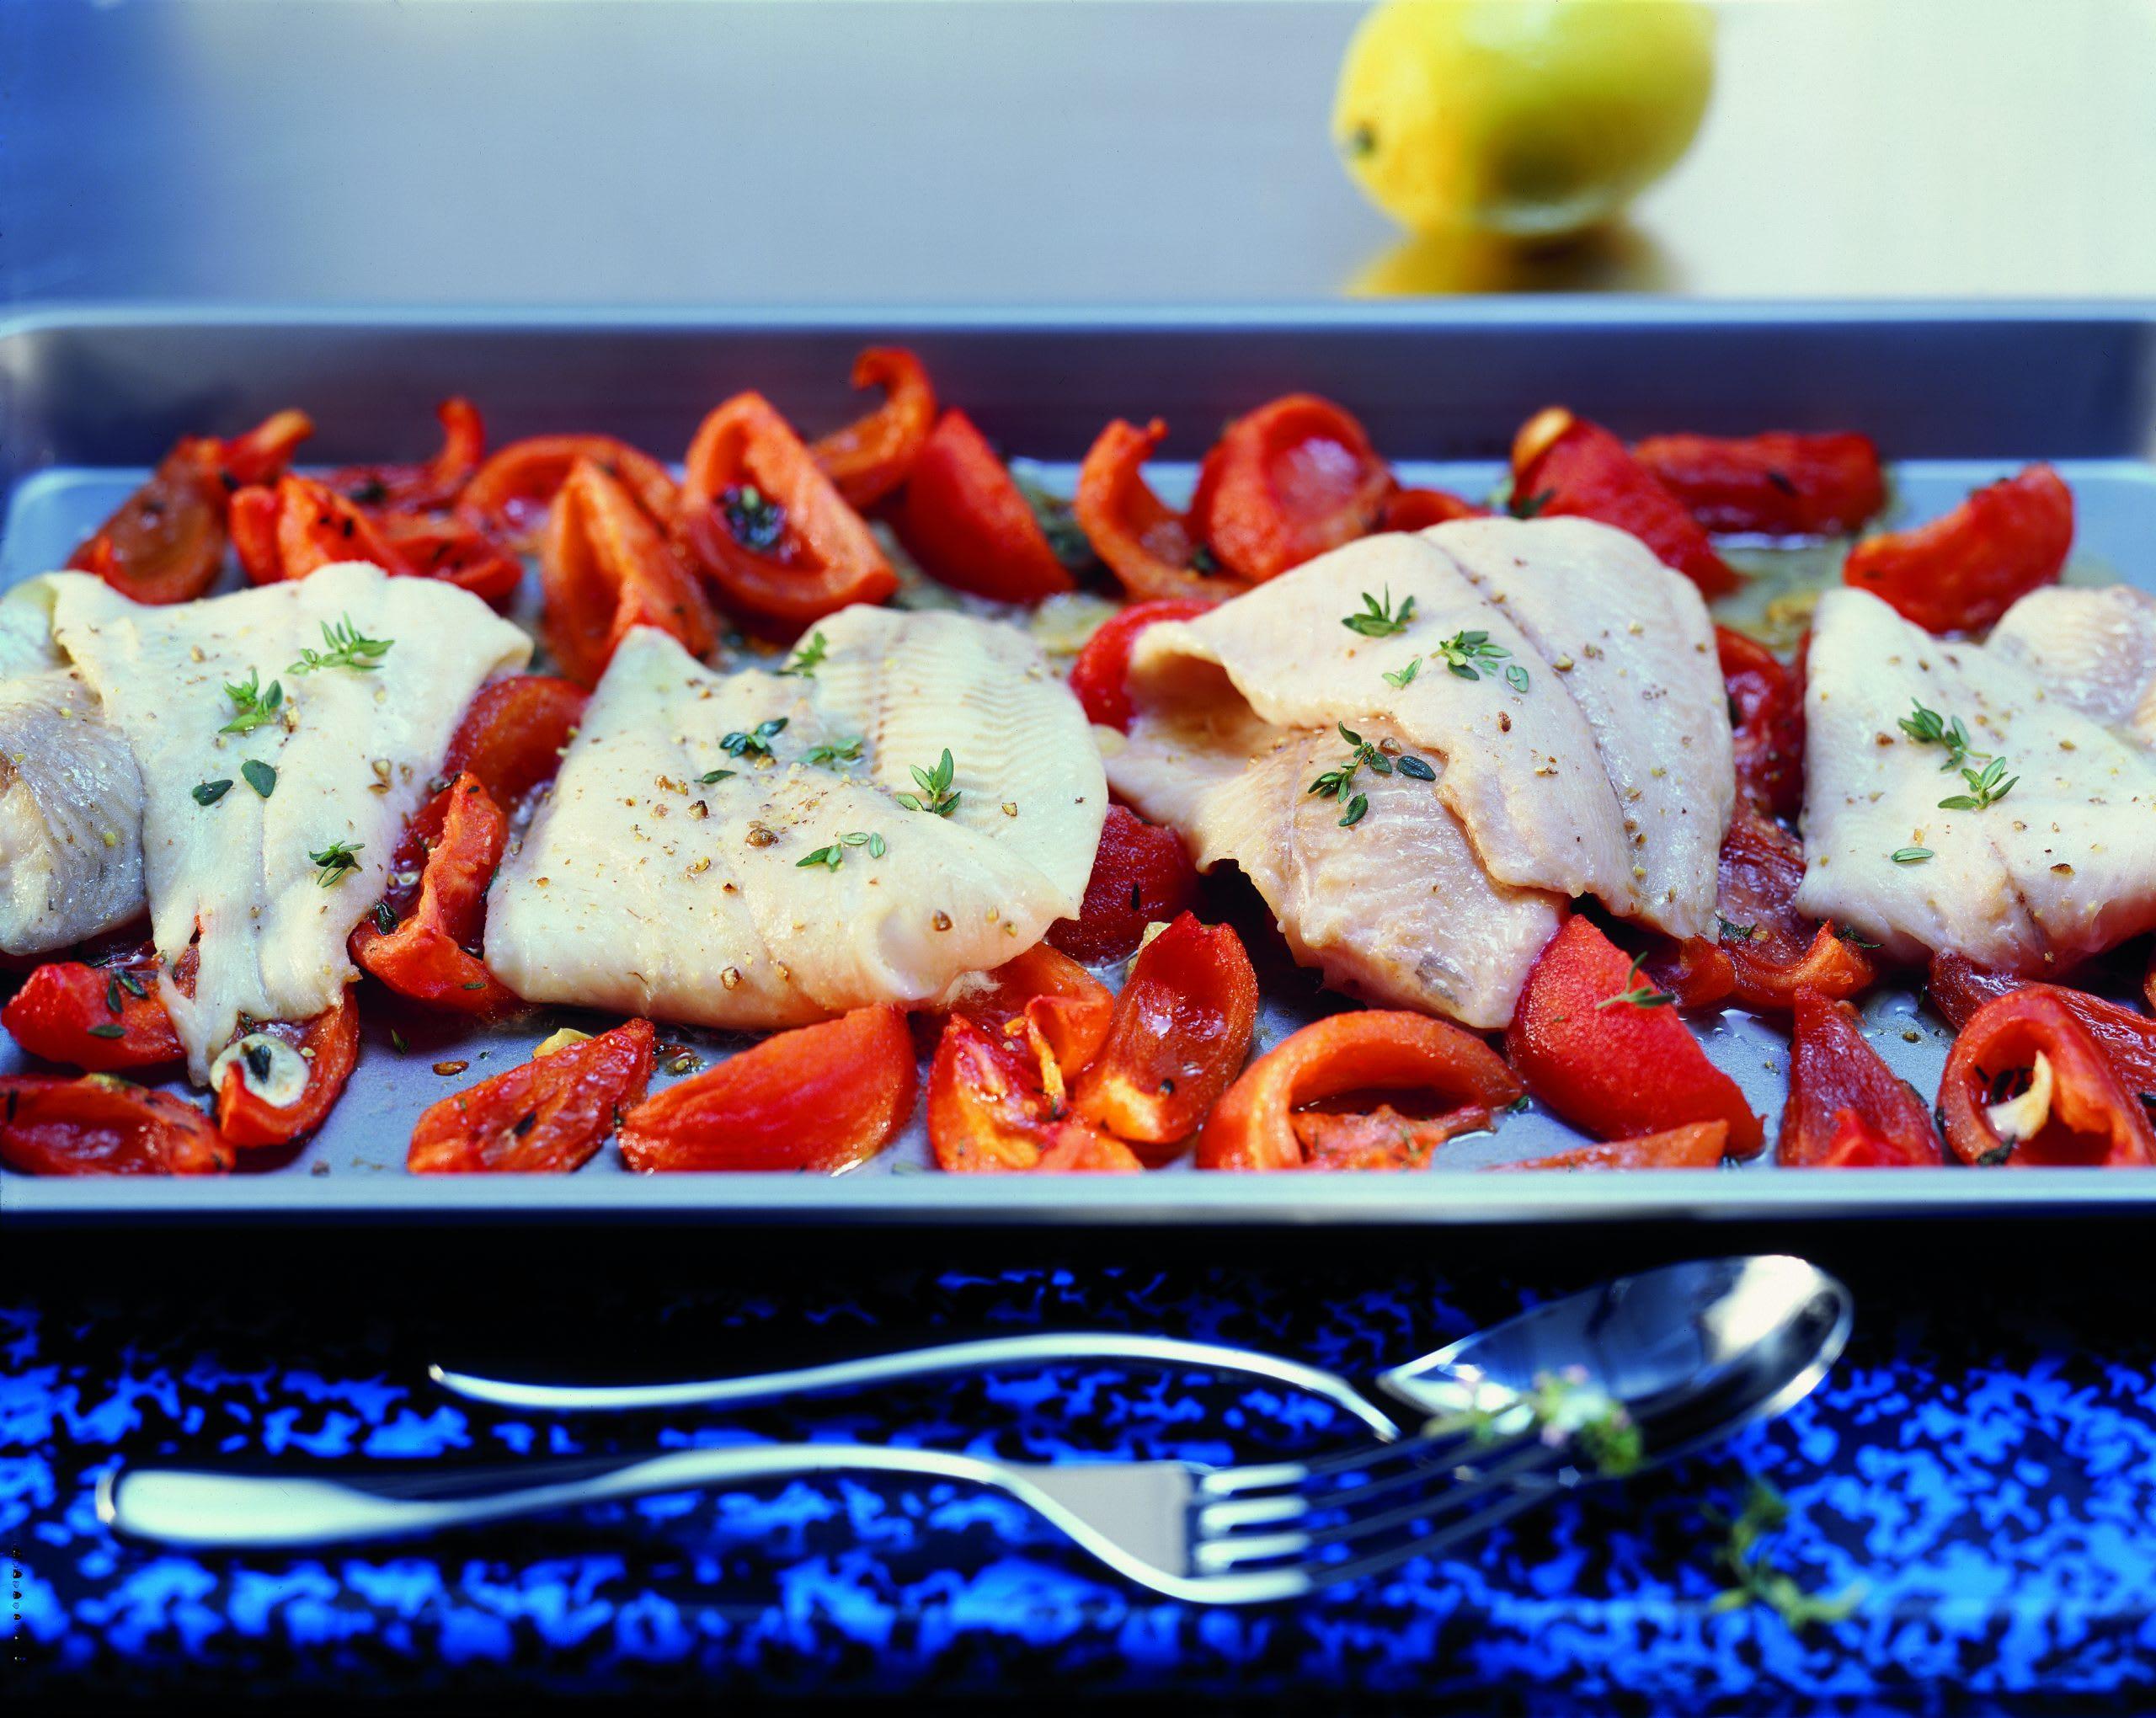 Fischfilets auf geschmolzenen Tomaten